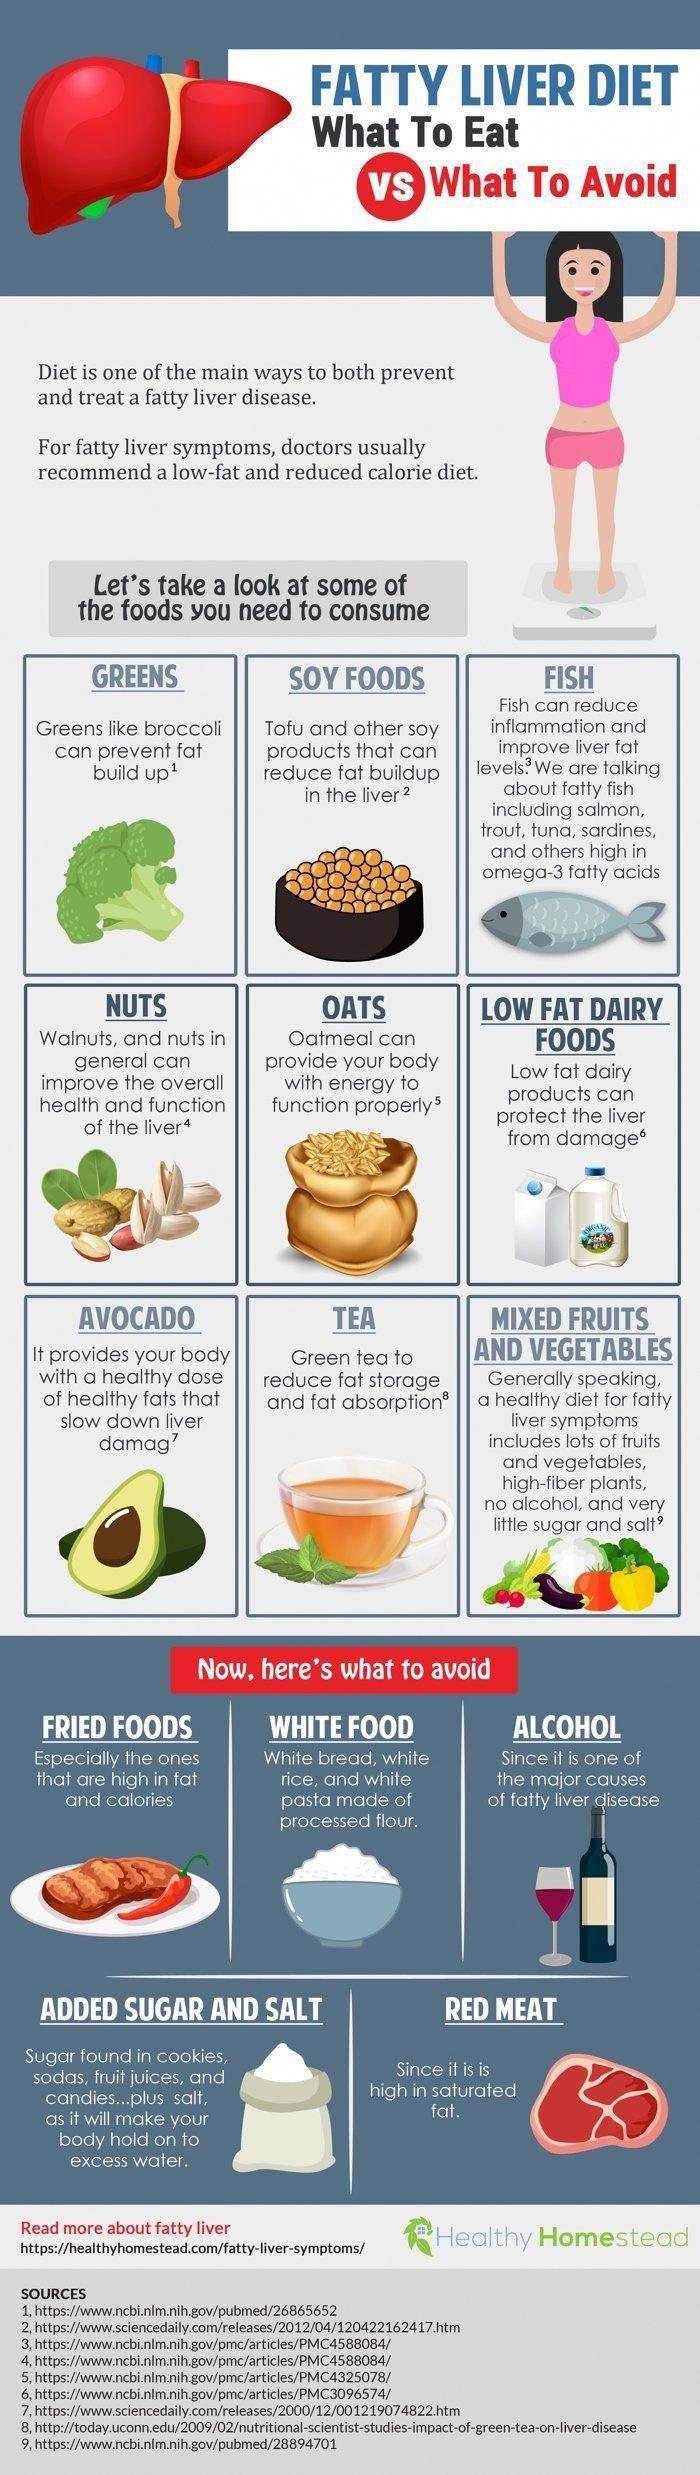 Fatty Liver Diet Liverdetoxcleanse Fatty Liver Symptoms Liver Diet Fatty Liver Diet